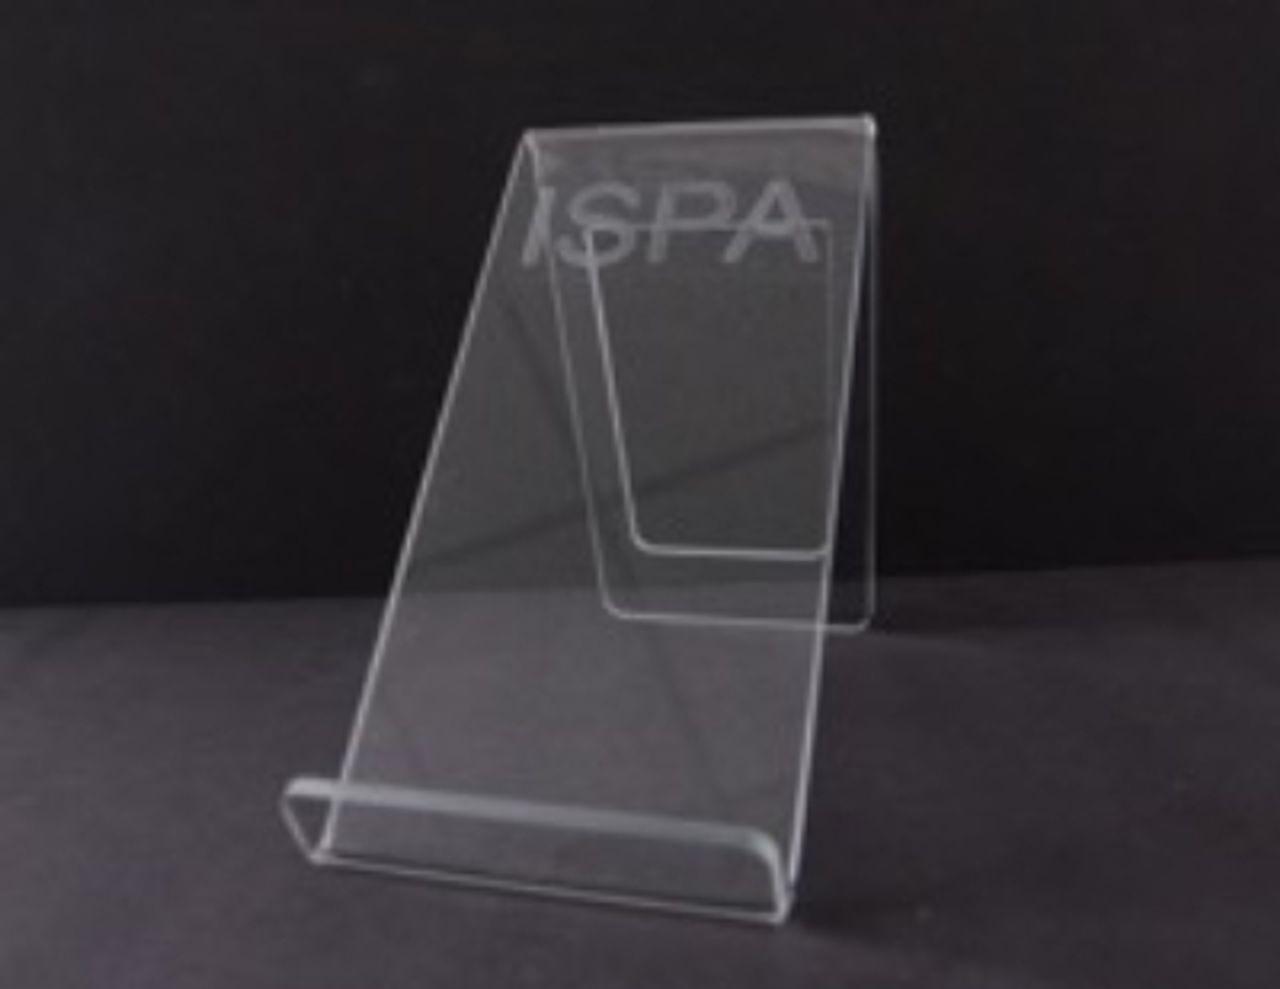 Folder display Ispa Plastics